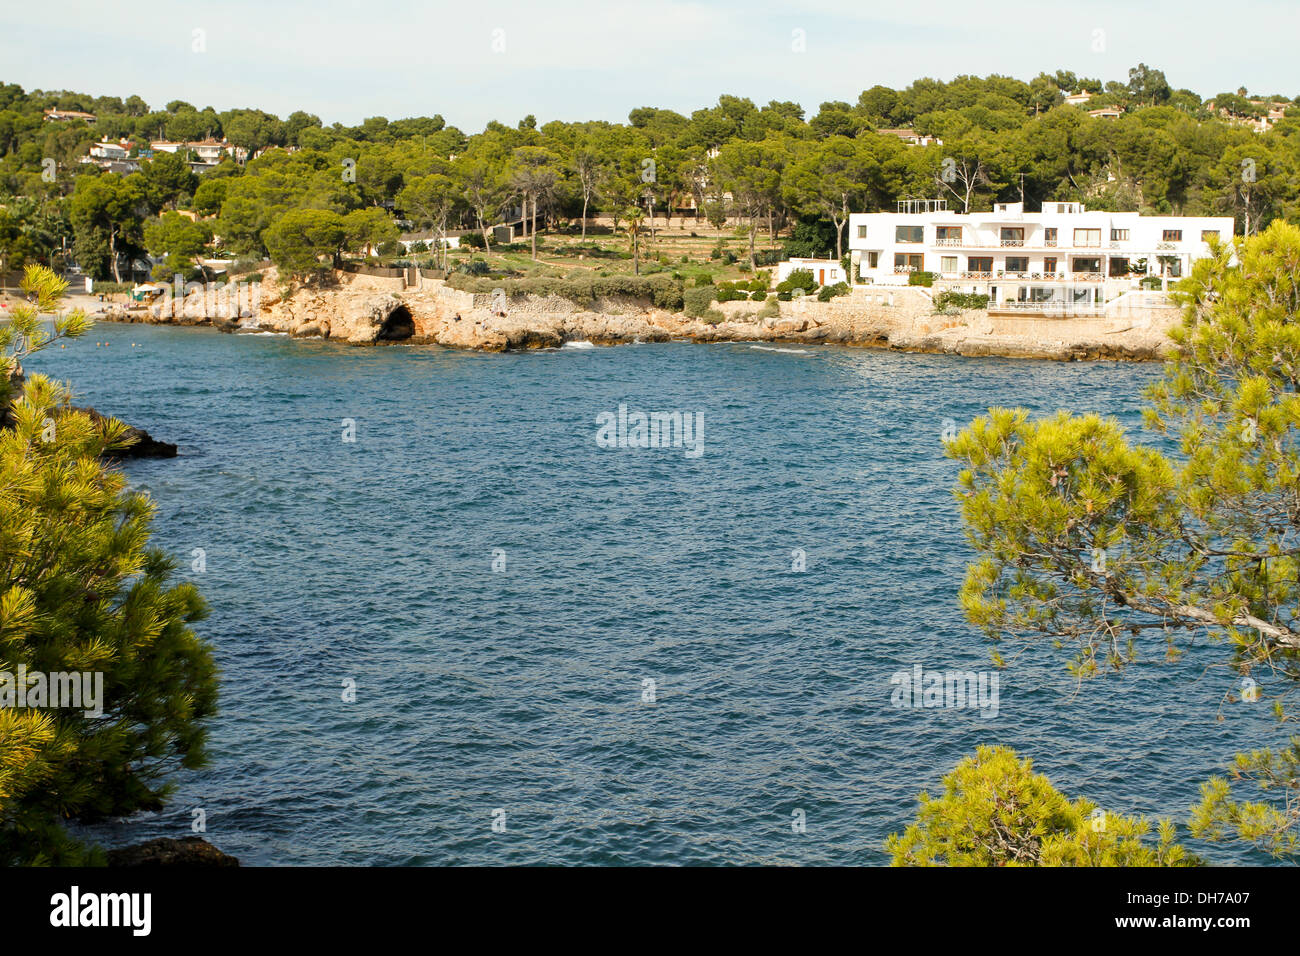 Portals Nous, Mallorca. - Stock Image